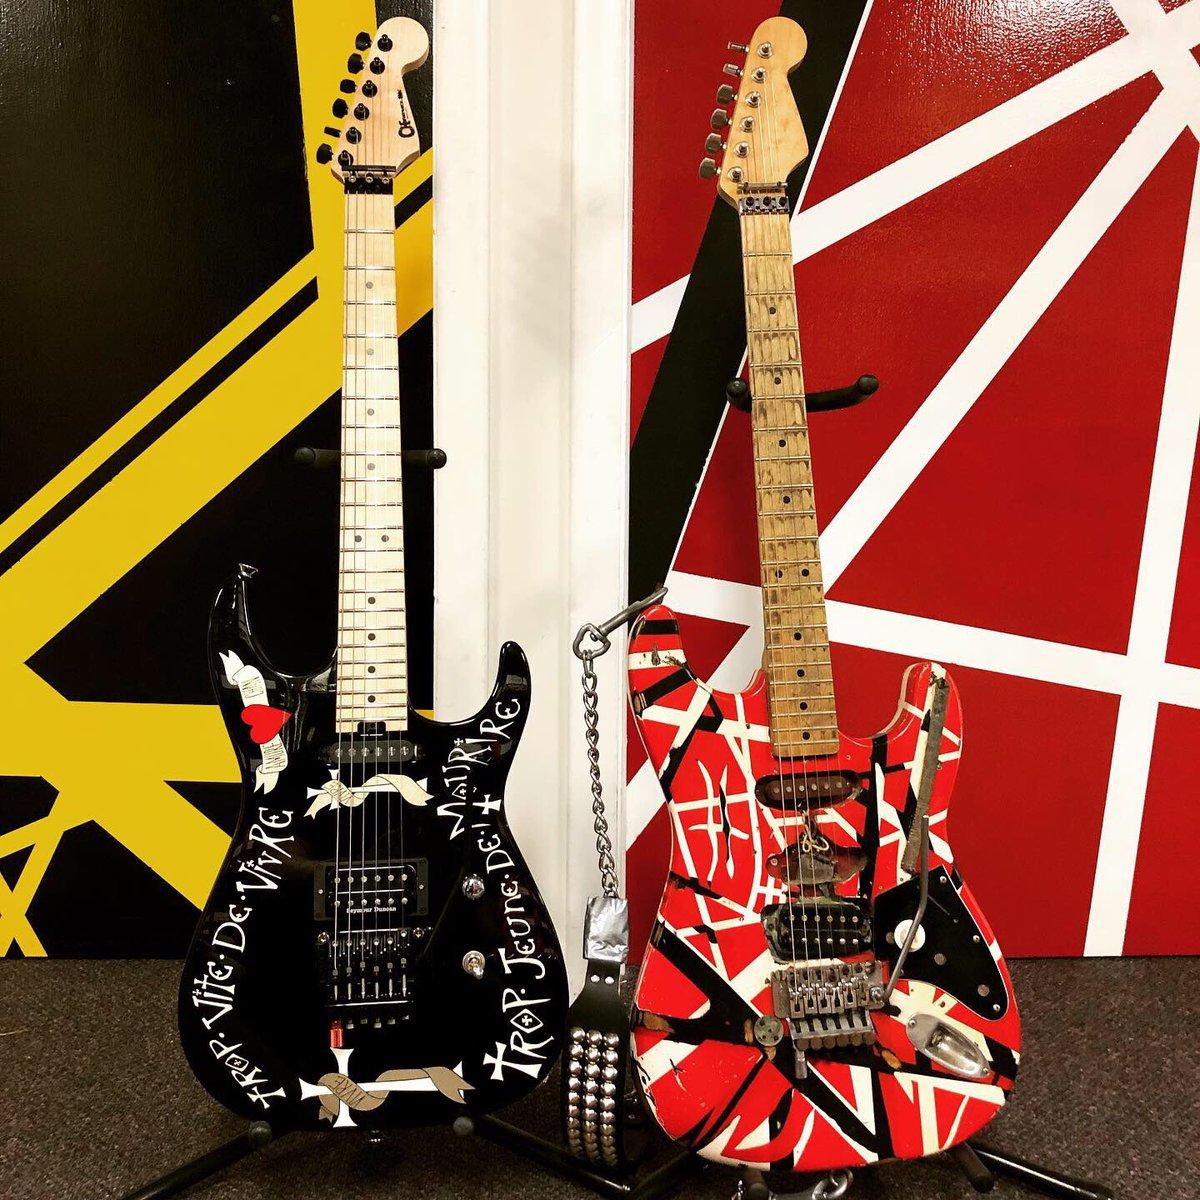 Loaded Guitars - A fitting pair of iconic cats! #futone #evh #WarrenDeMartini  #guitar #guitars #icon #vanhalen #ratt